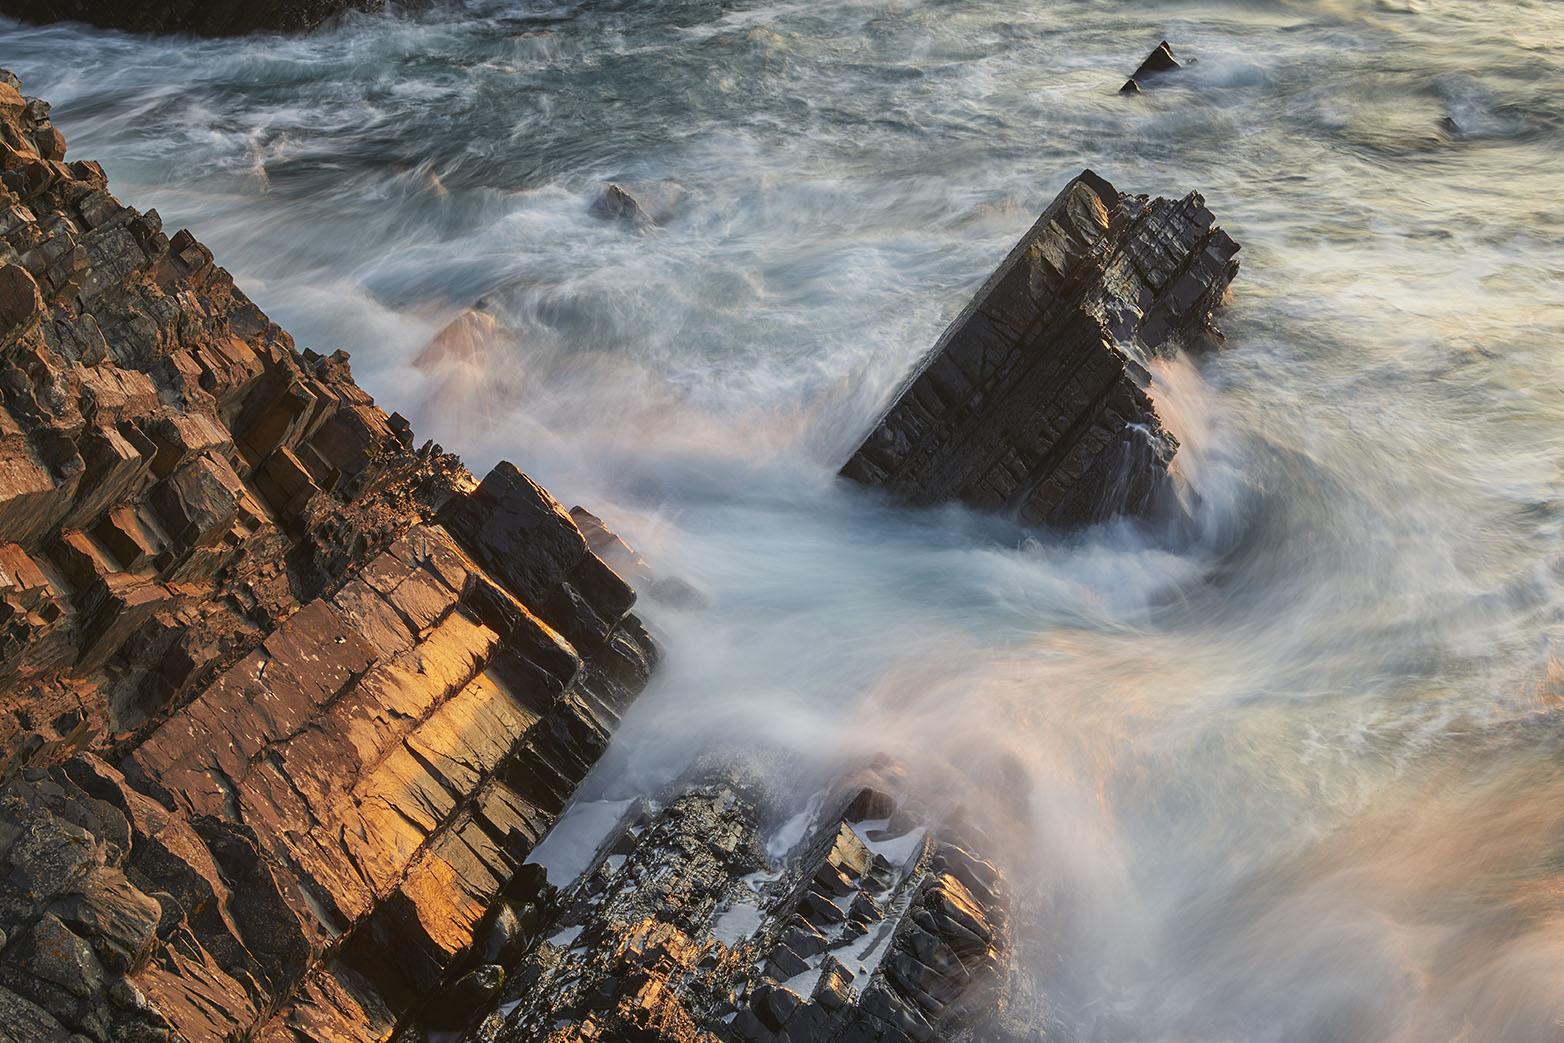 Sunset Shoreline Rocks print; Solid Rocks, Swirling Waves